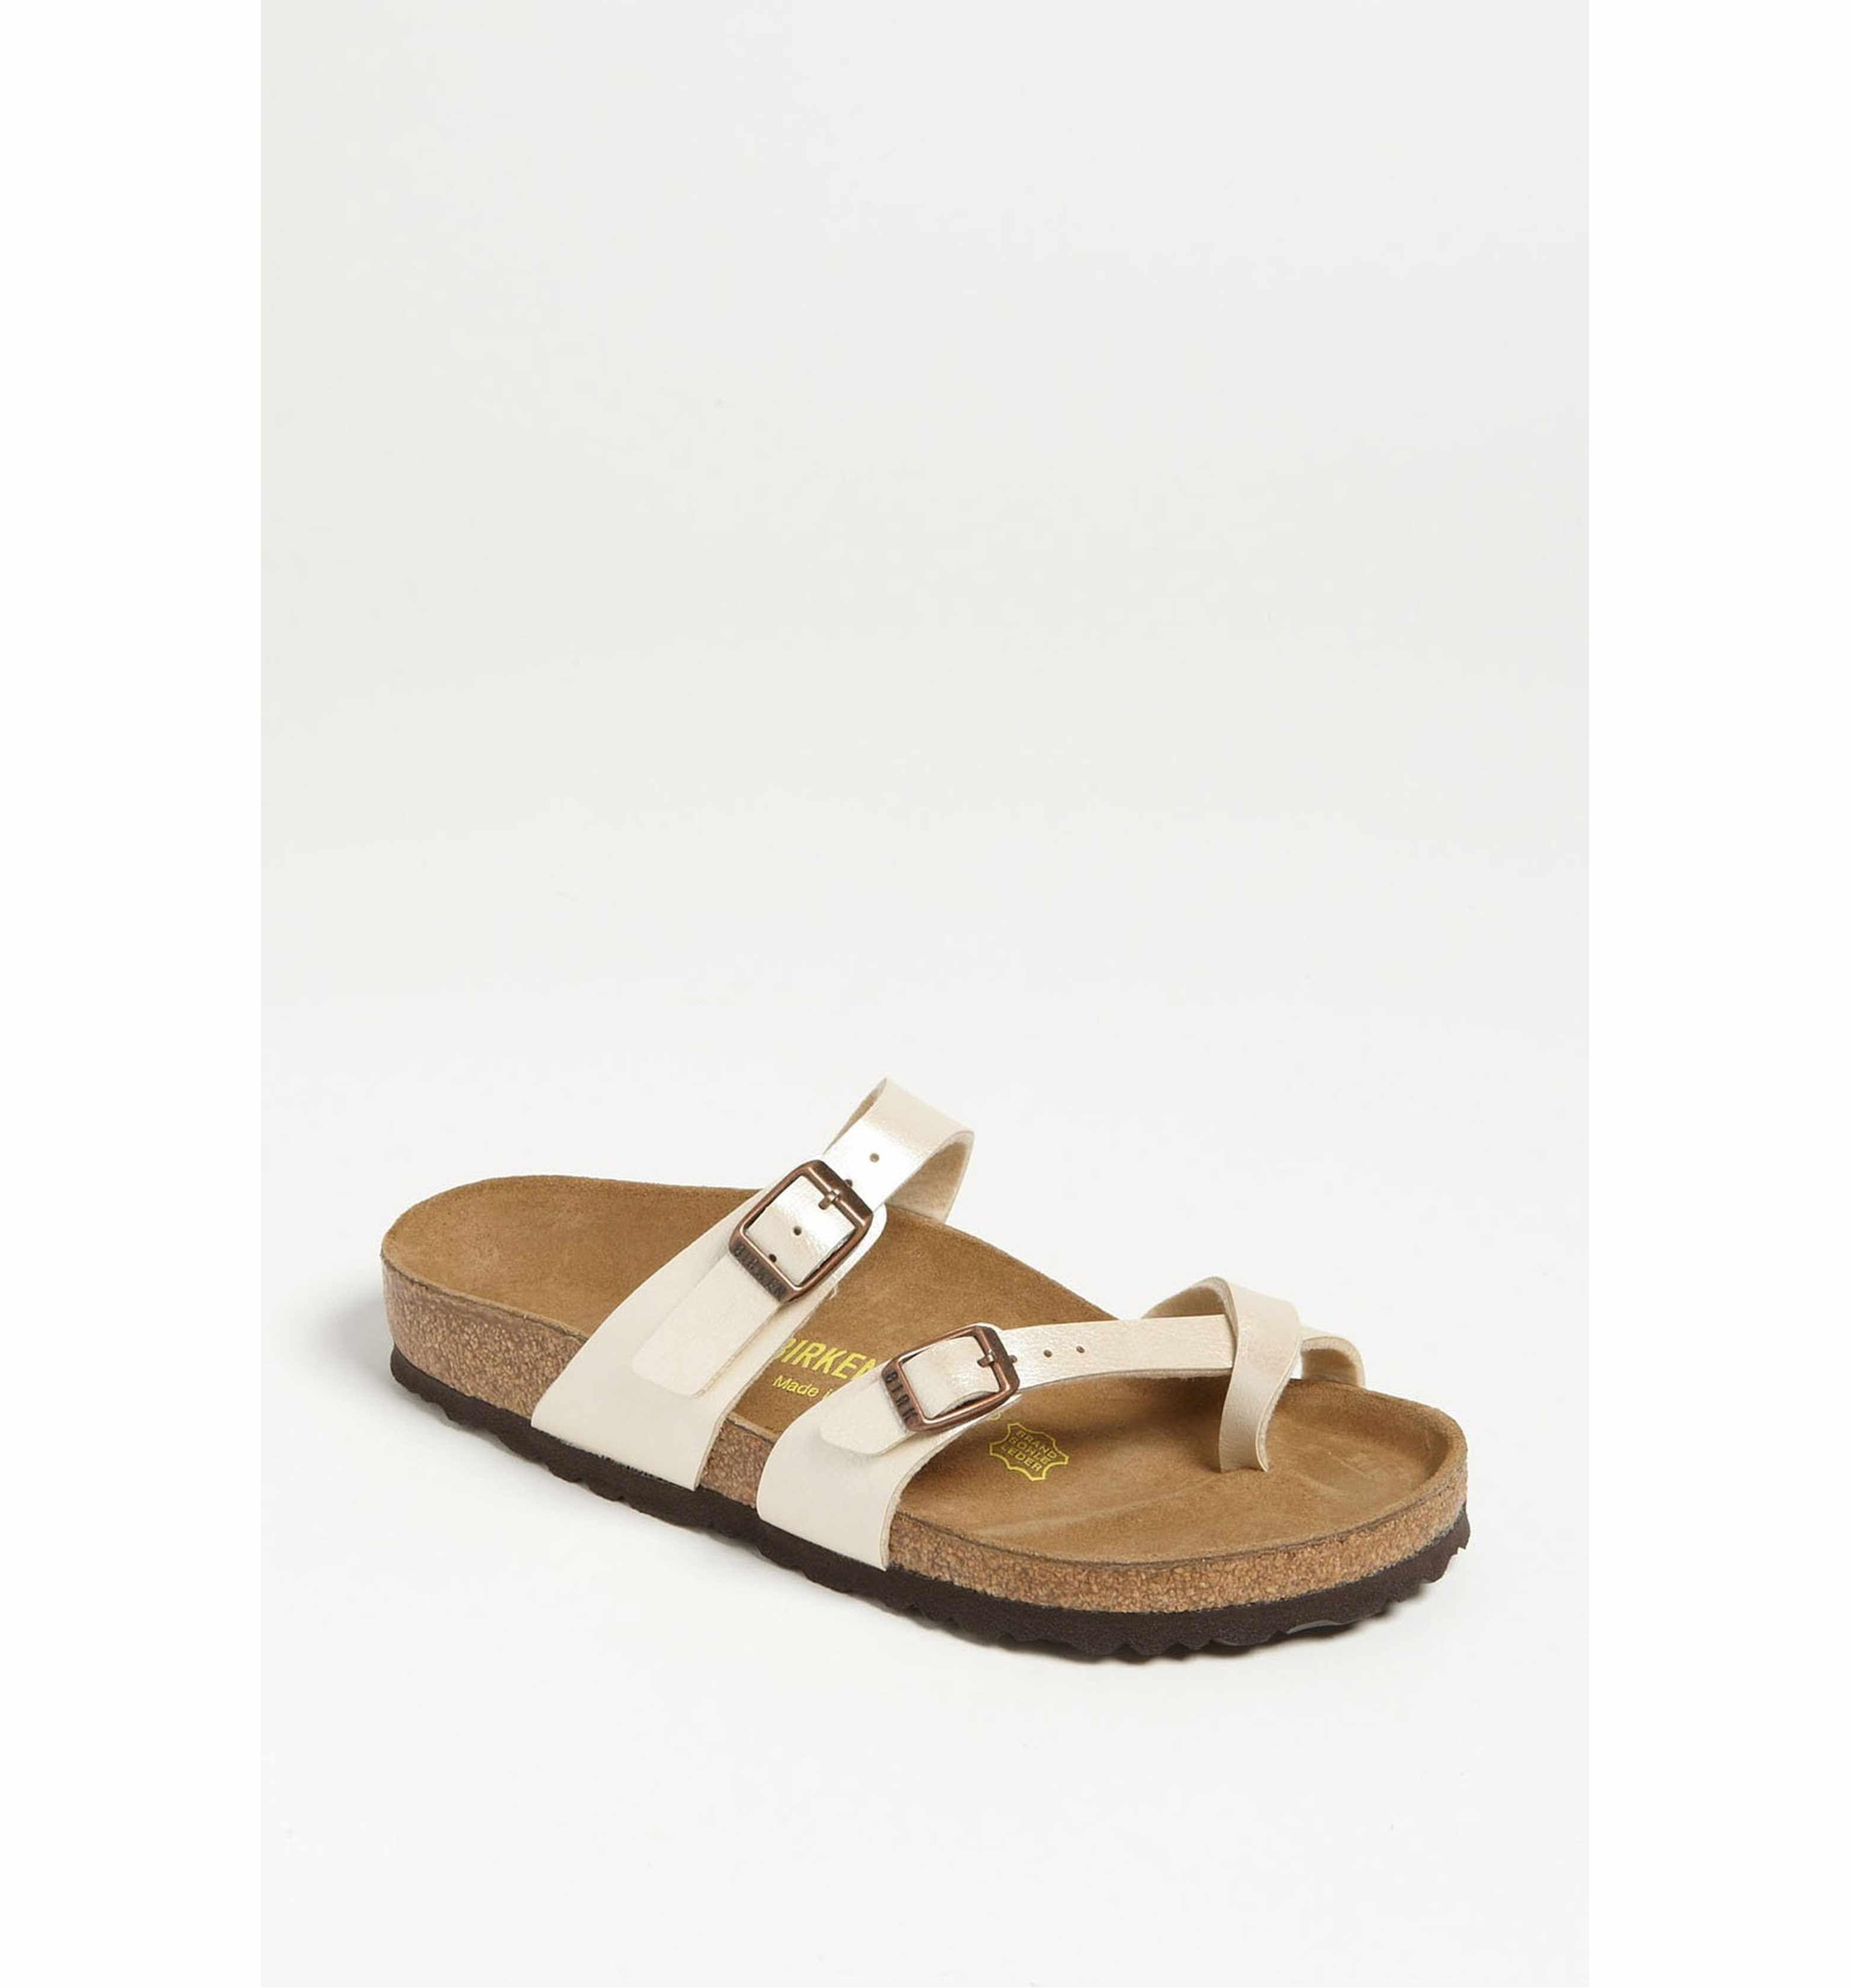 484a840ad28b Main Image - Birkenstock  Mayari  Birko-Flor™ Sandal (Women ...